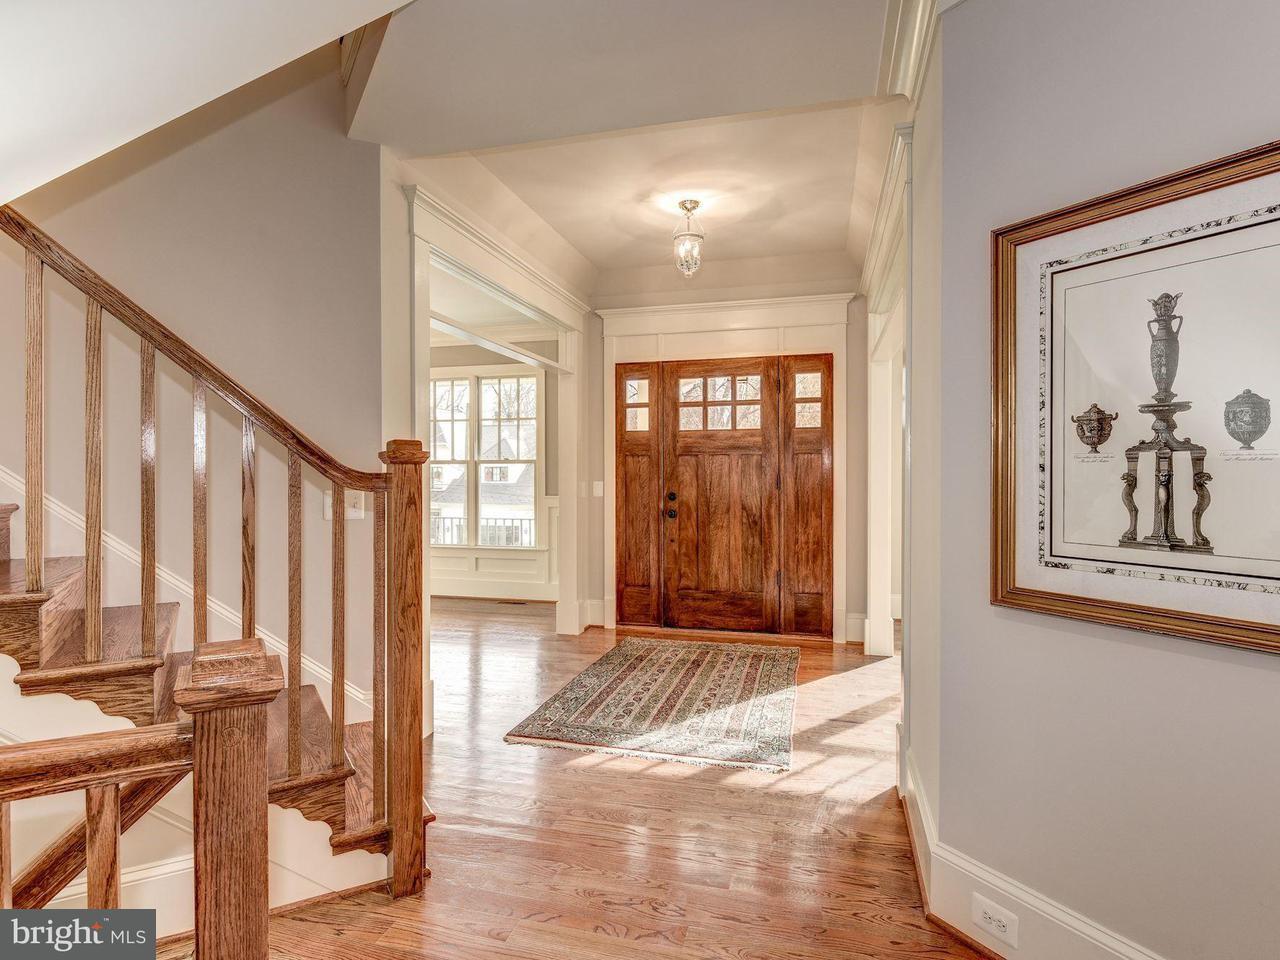 Single Family Home for Sale at 3536 UTAH Street 3536 UTAH Street Arlington, Virginia 22207 United States